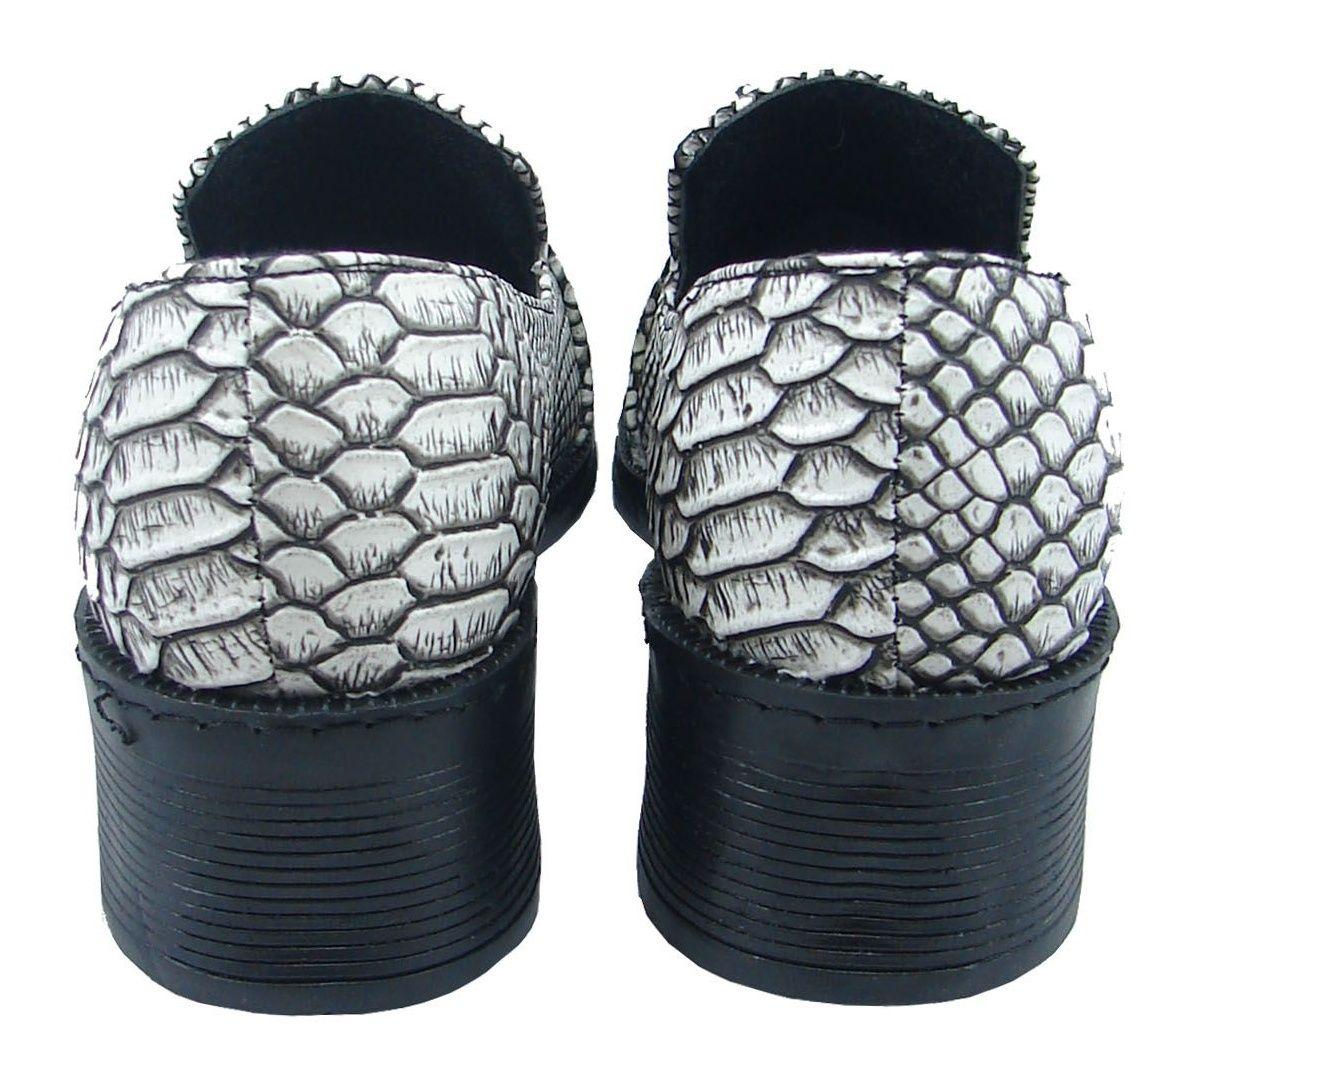 کفش زنانه کد 0024 main 1 3